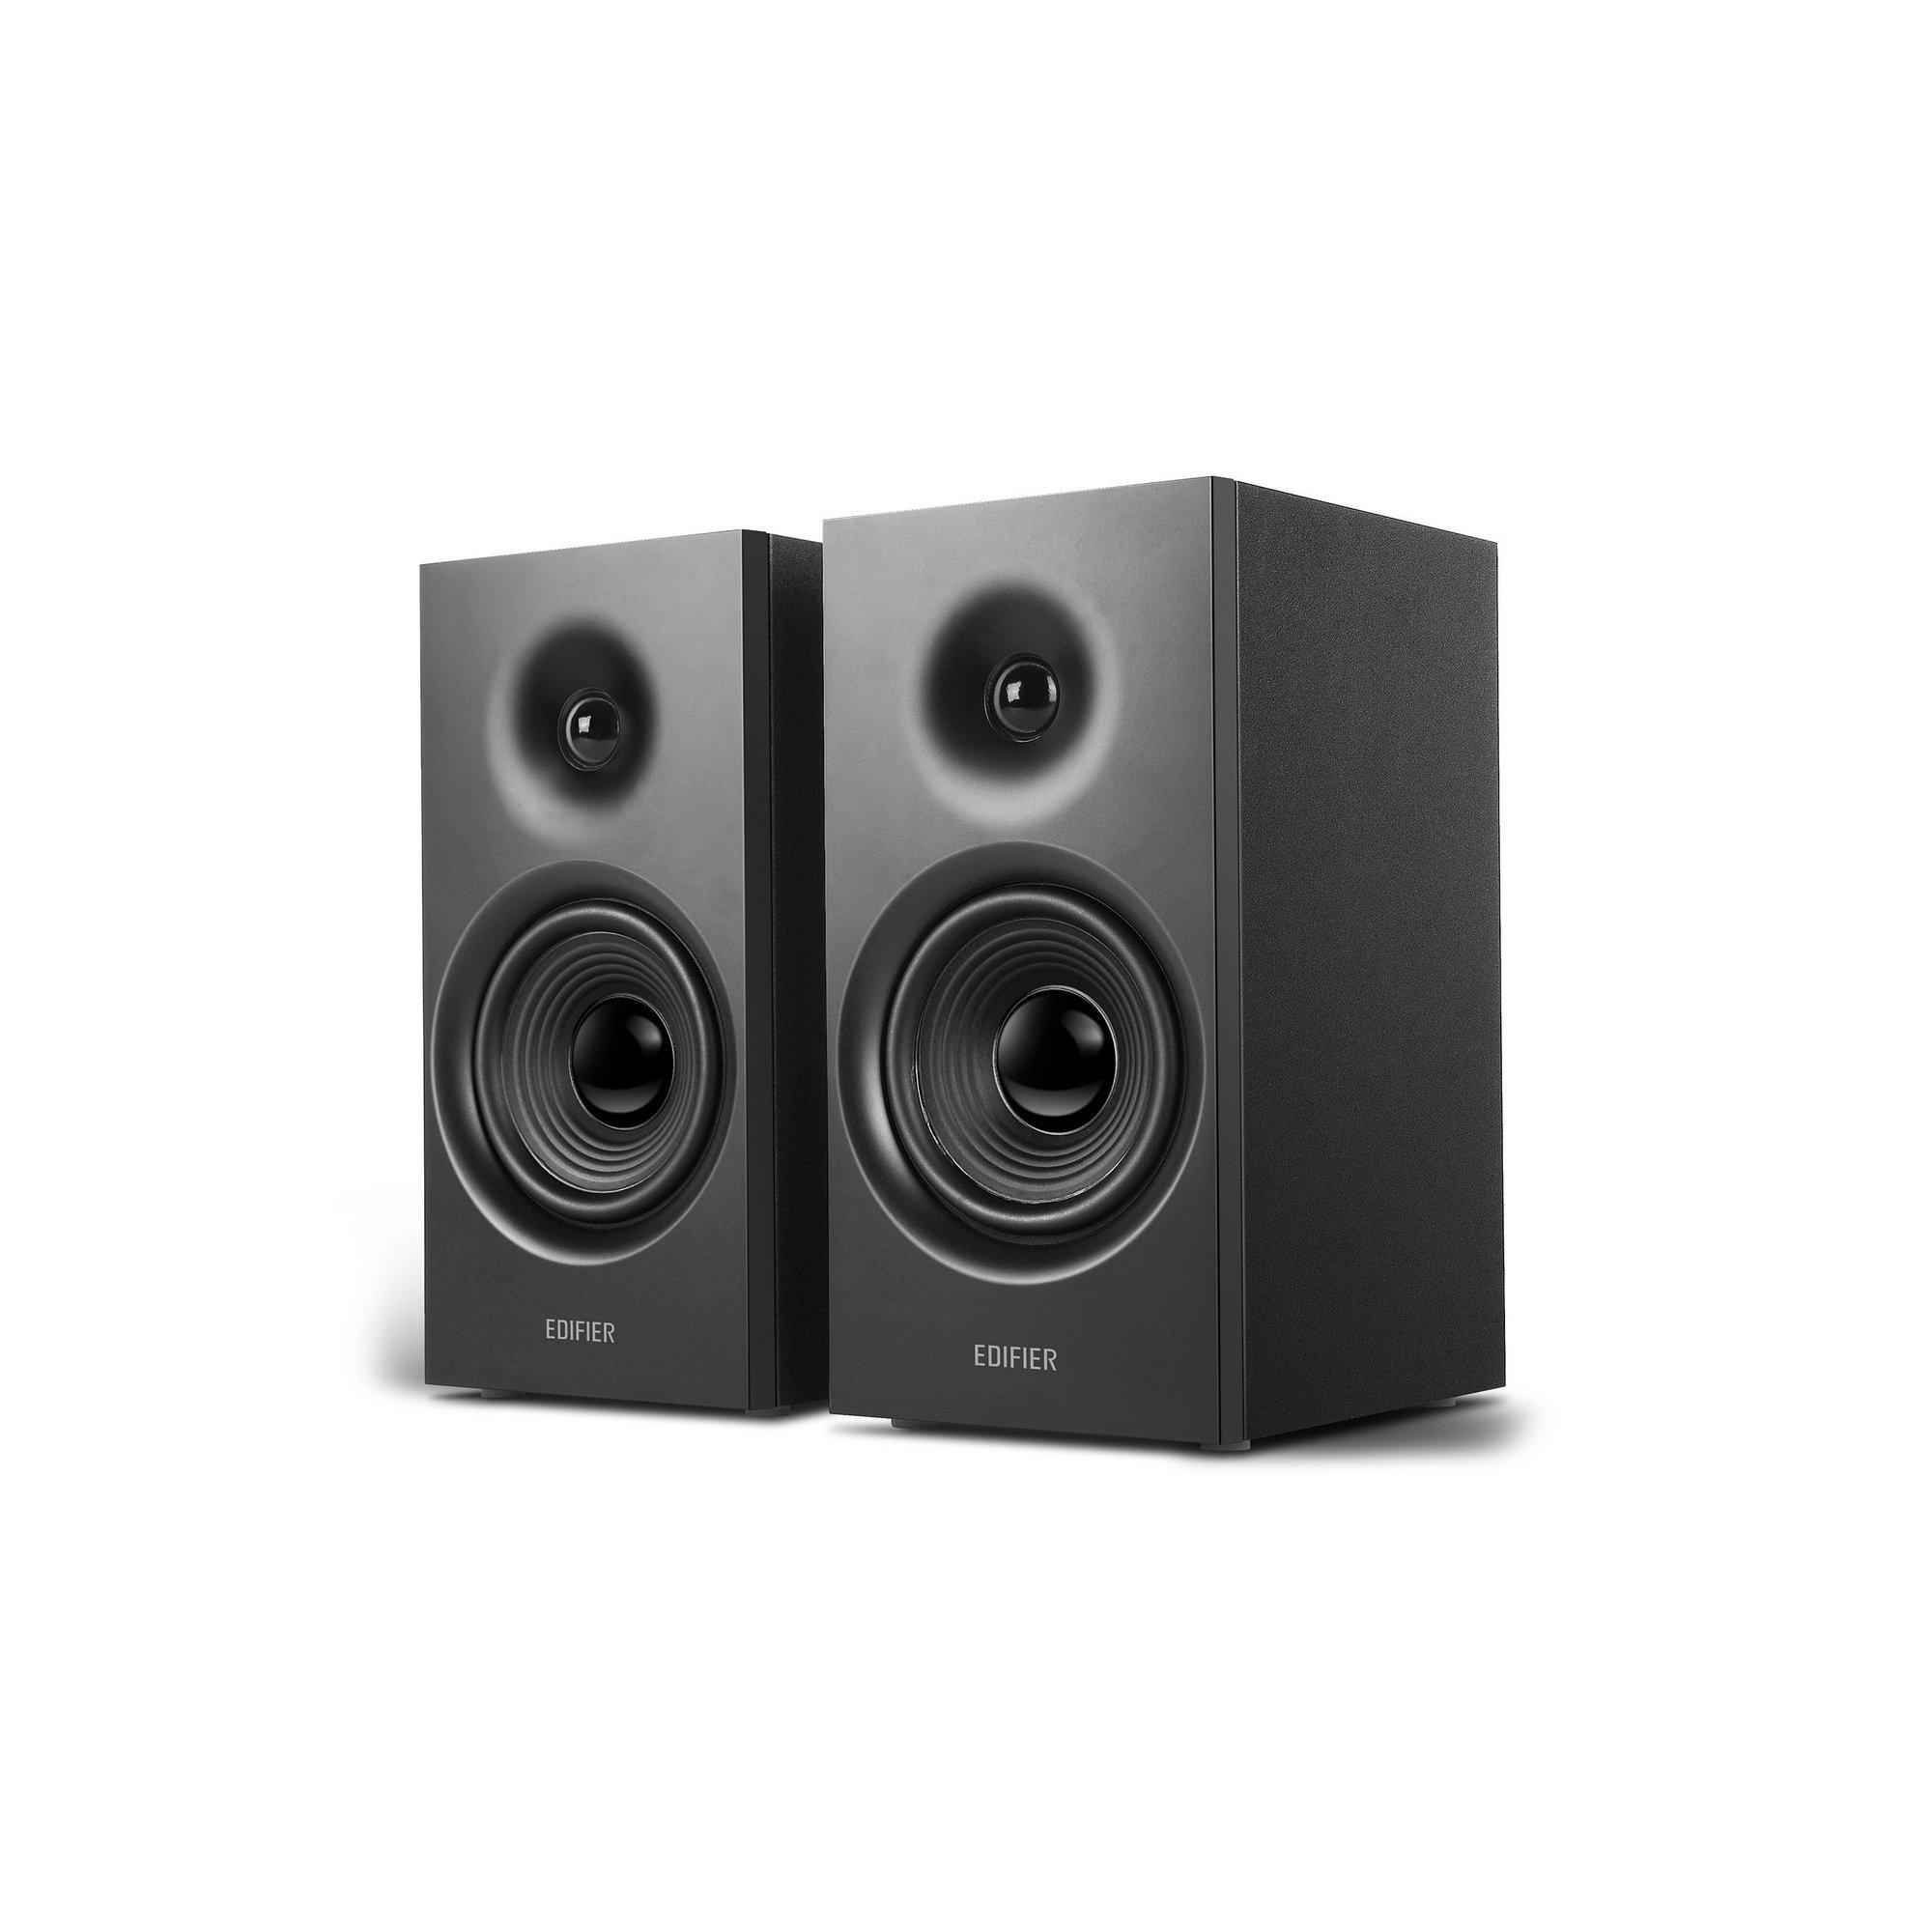 Image of Edifier R1080BT Active Bluetooth Bookshelf Speaker Set